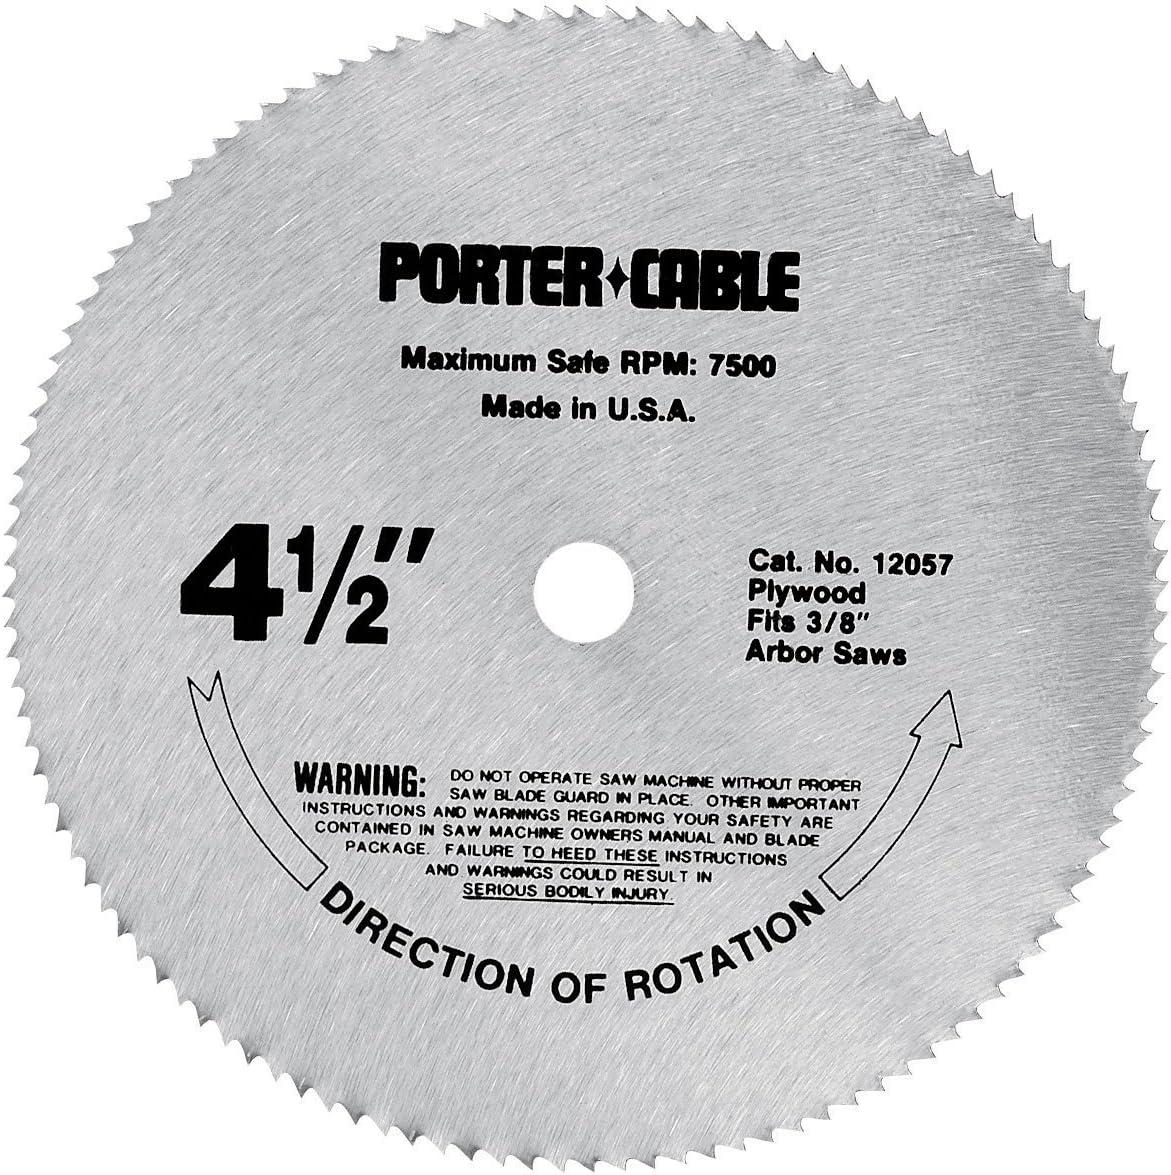 PORTER-CABLE 4-1/2inch Circular Saw Blade